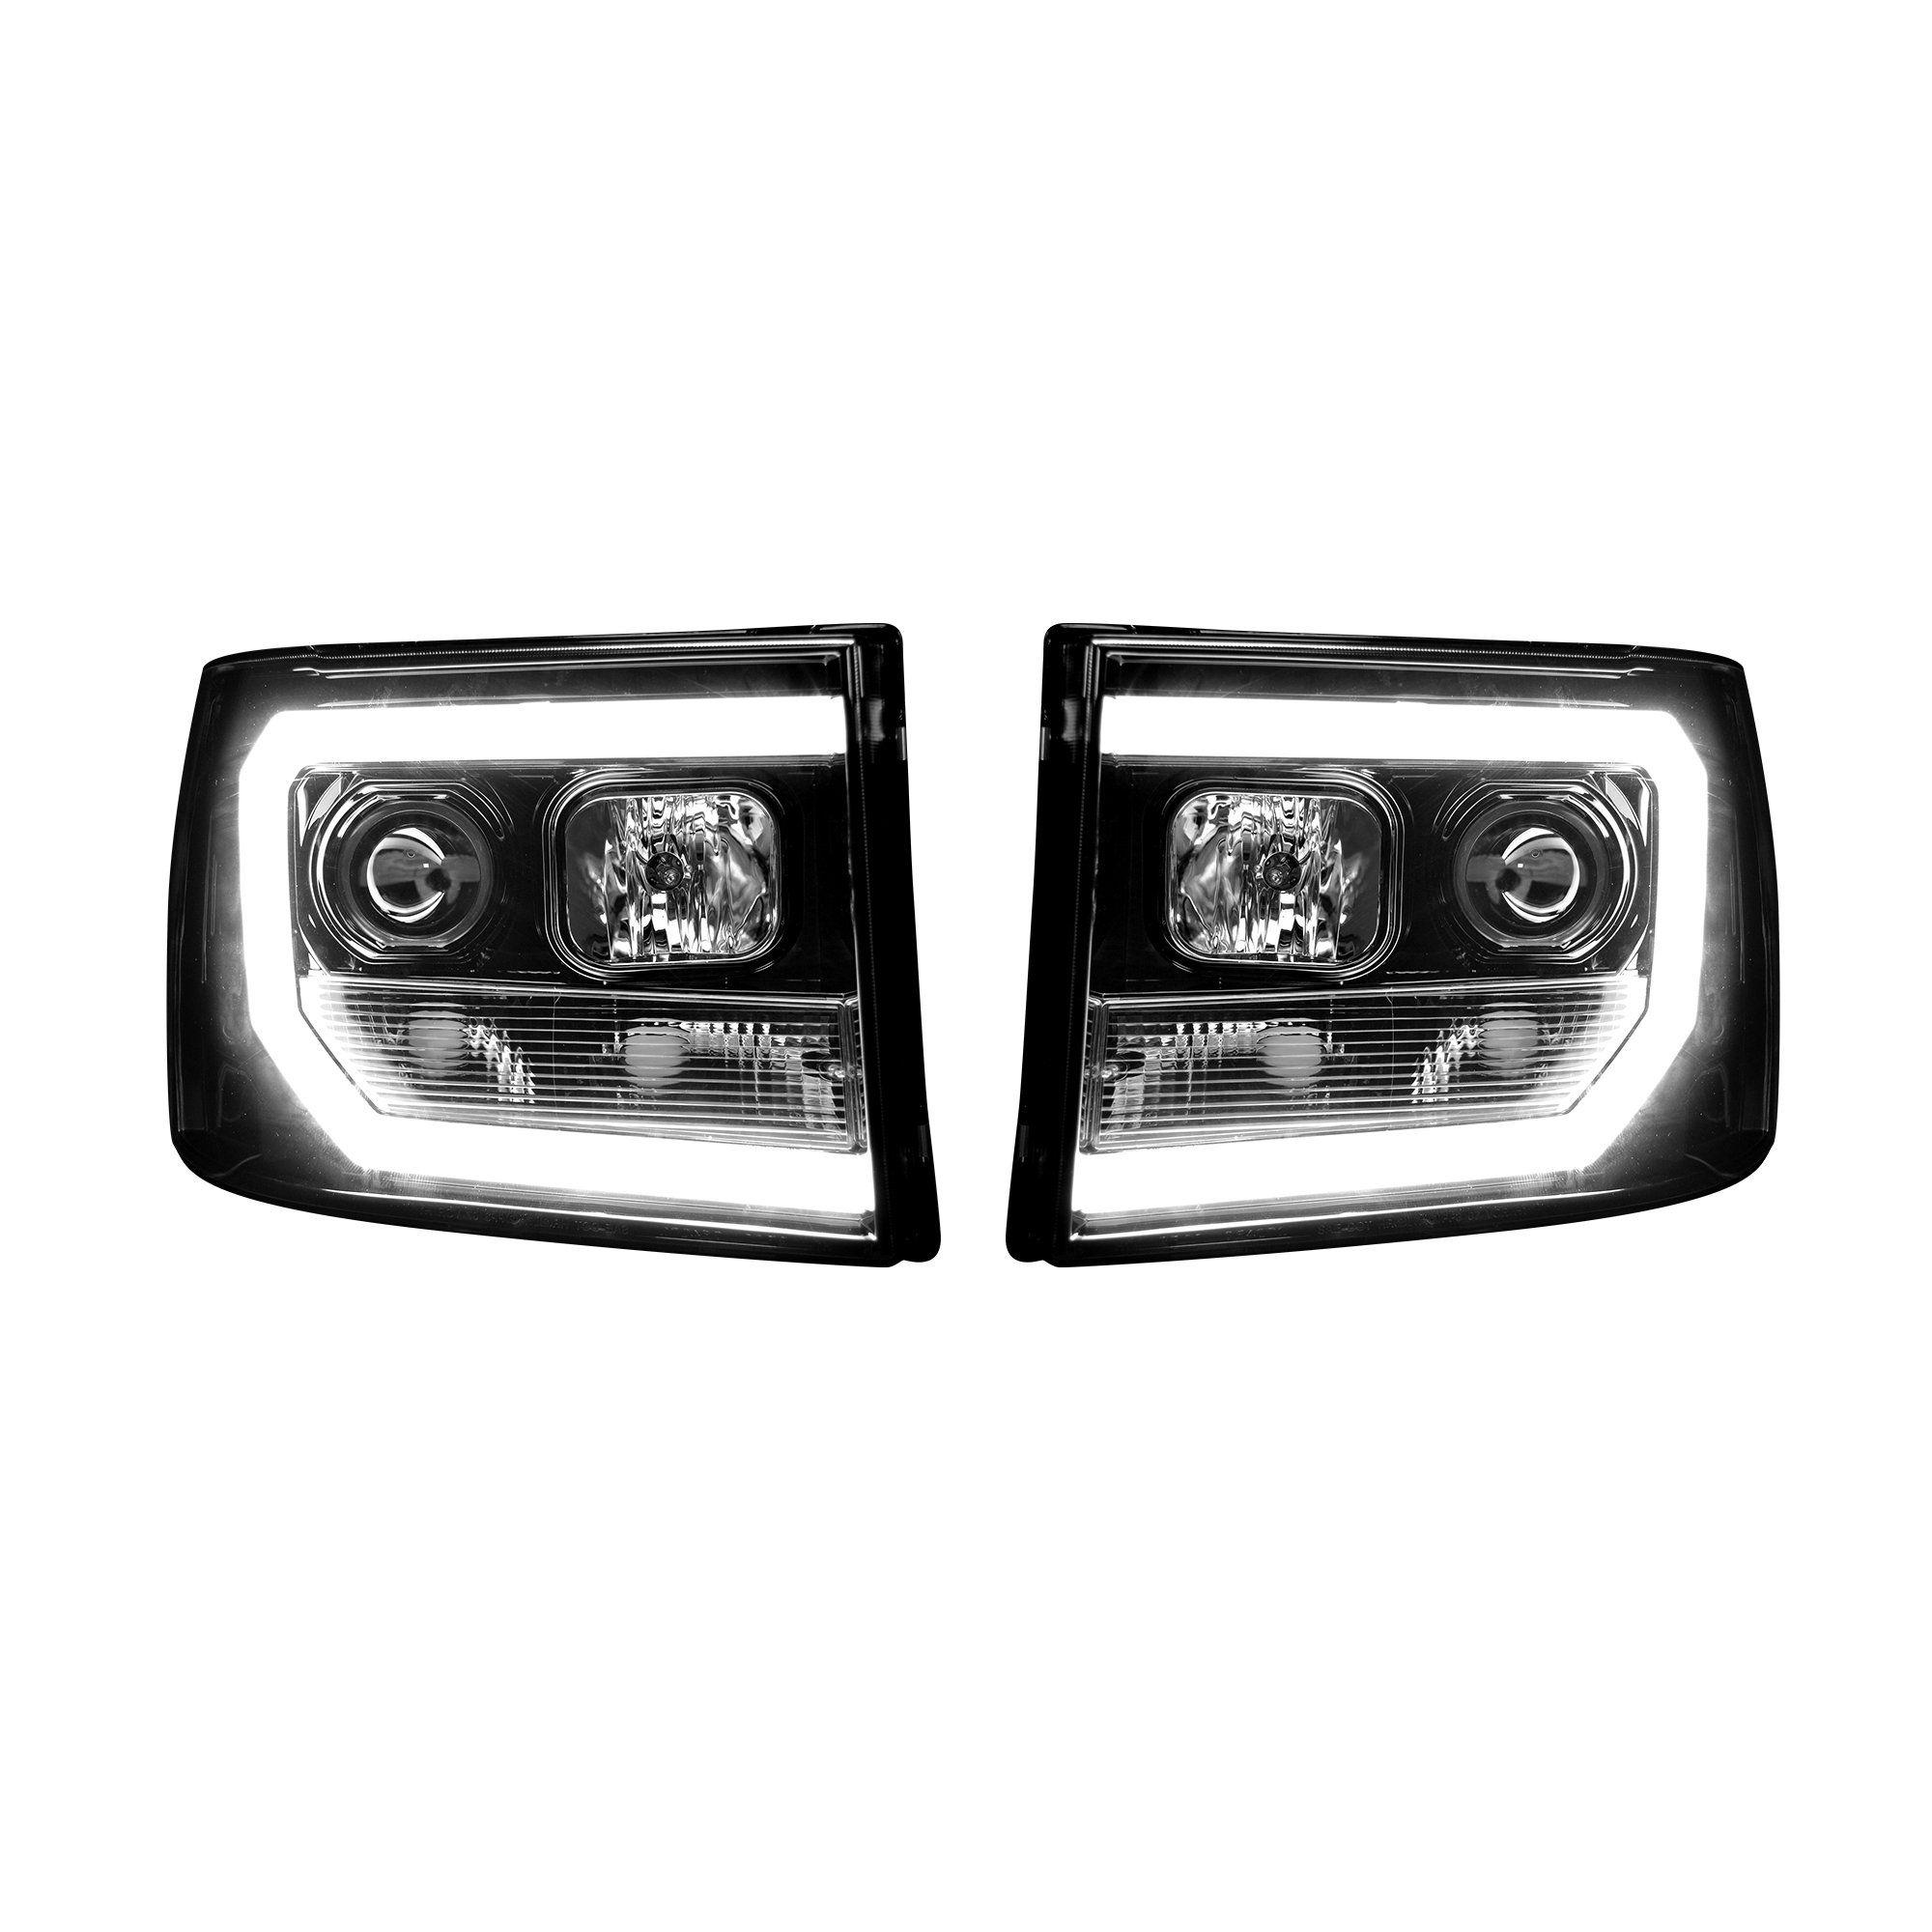 Gmc Sierra 07 13 Projector Headlights Oled Halos Drl Smoked Black Projector Headlights Gmc Sierra Truck Accessories